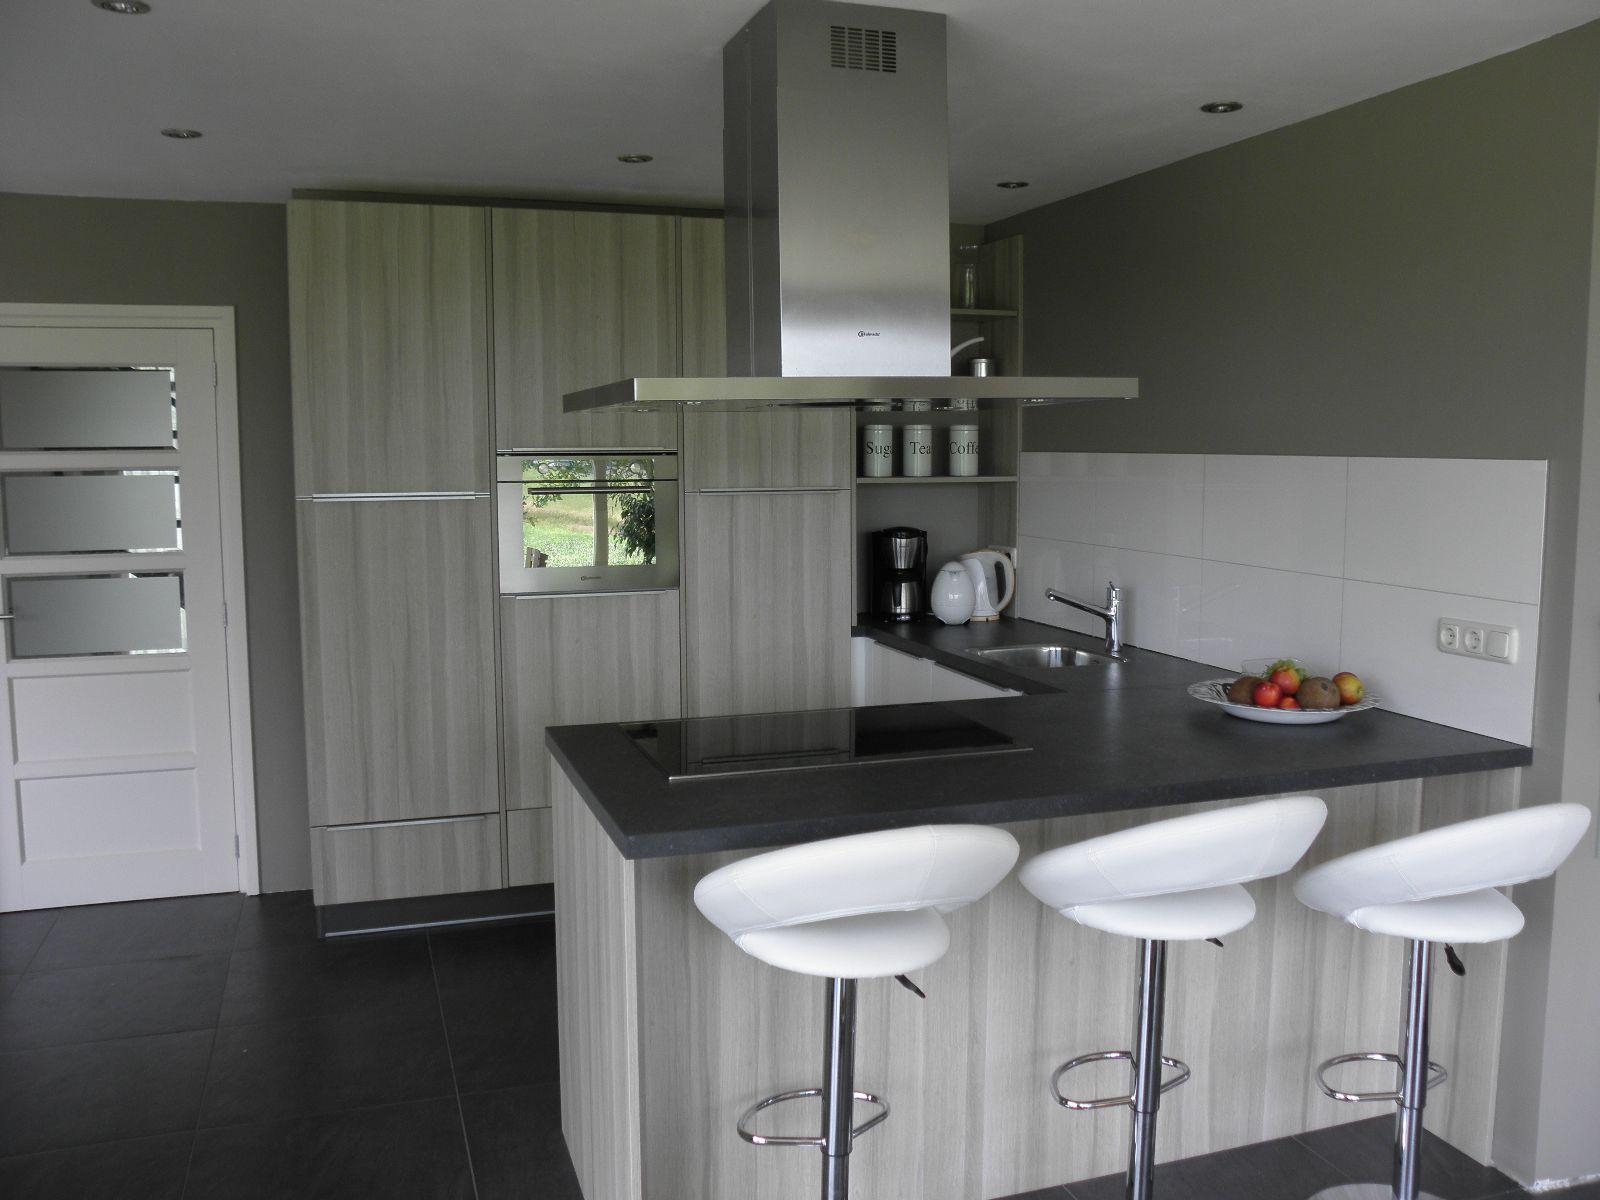 Aanbevolen 4189 moderne meubels zwolle afbeelding foto beste voorbeelden afbeeldingen - Afbeelding van moderne keuken ...